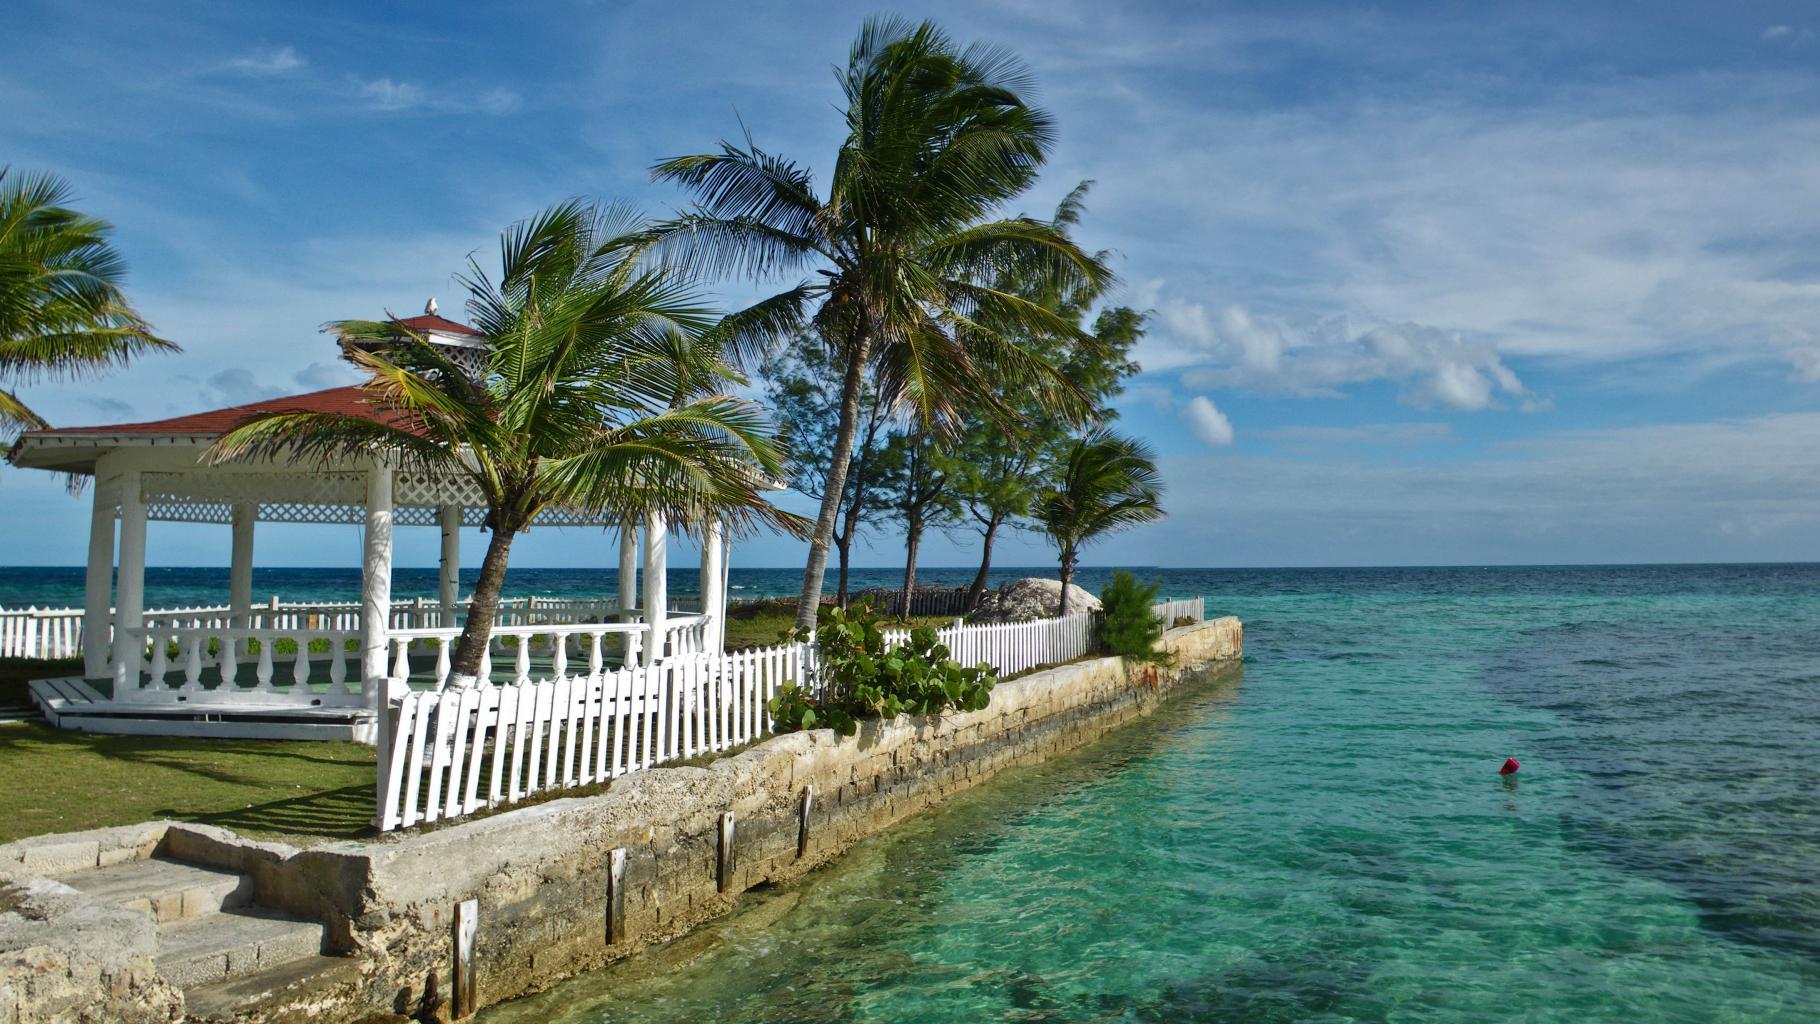 Ein Pavillon unter Palmen am Meer